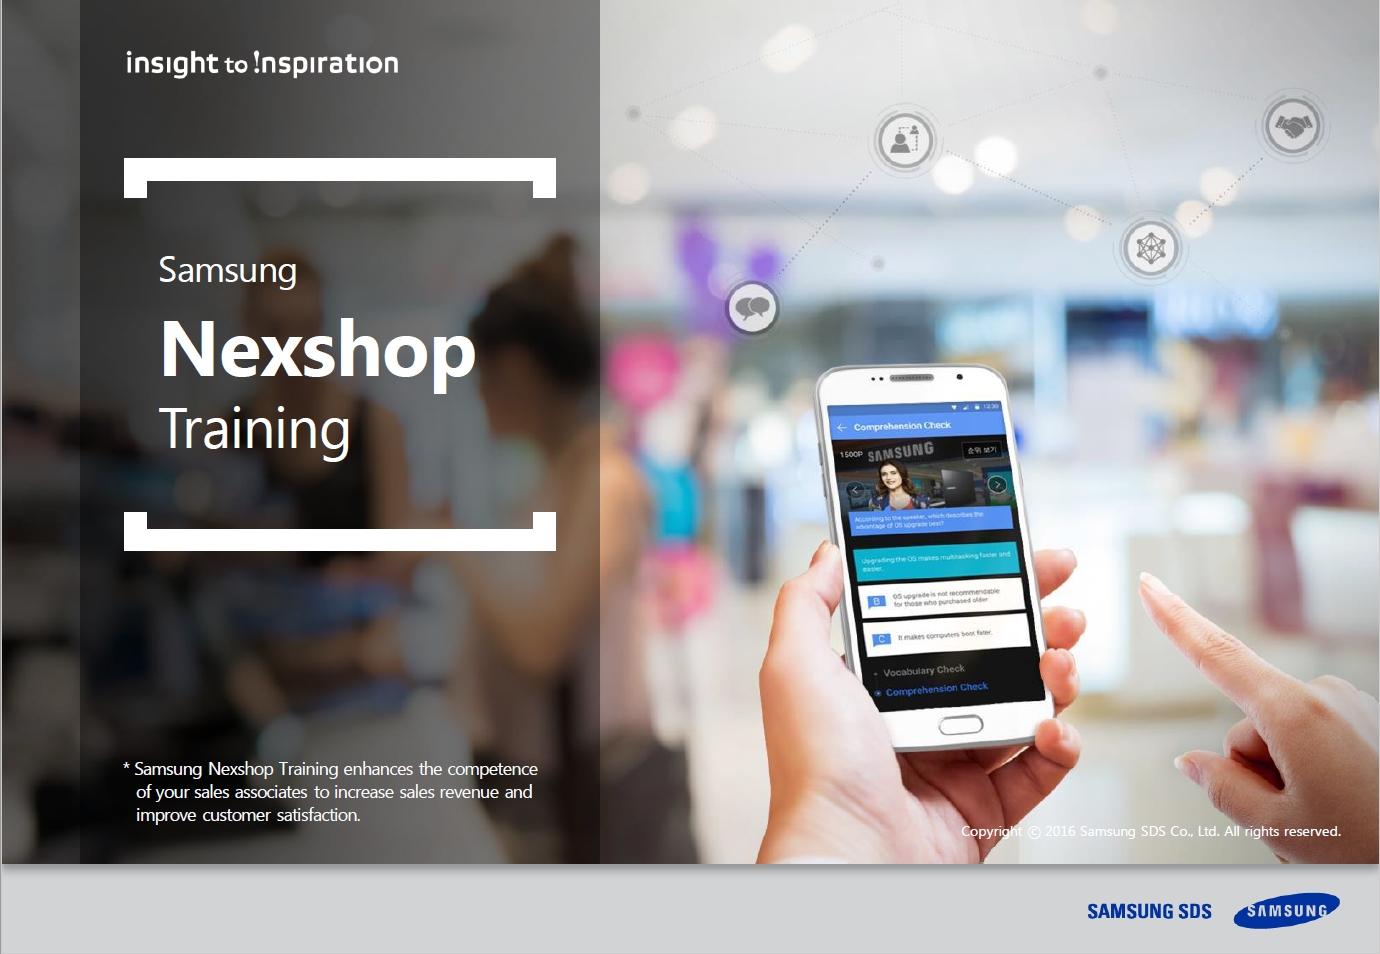 [Nexshop Training] Transform your trainees into product experts